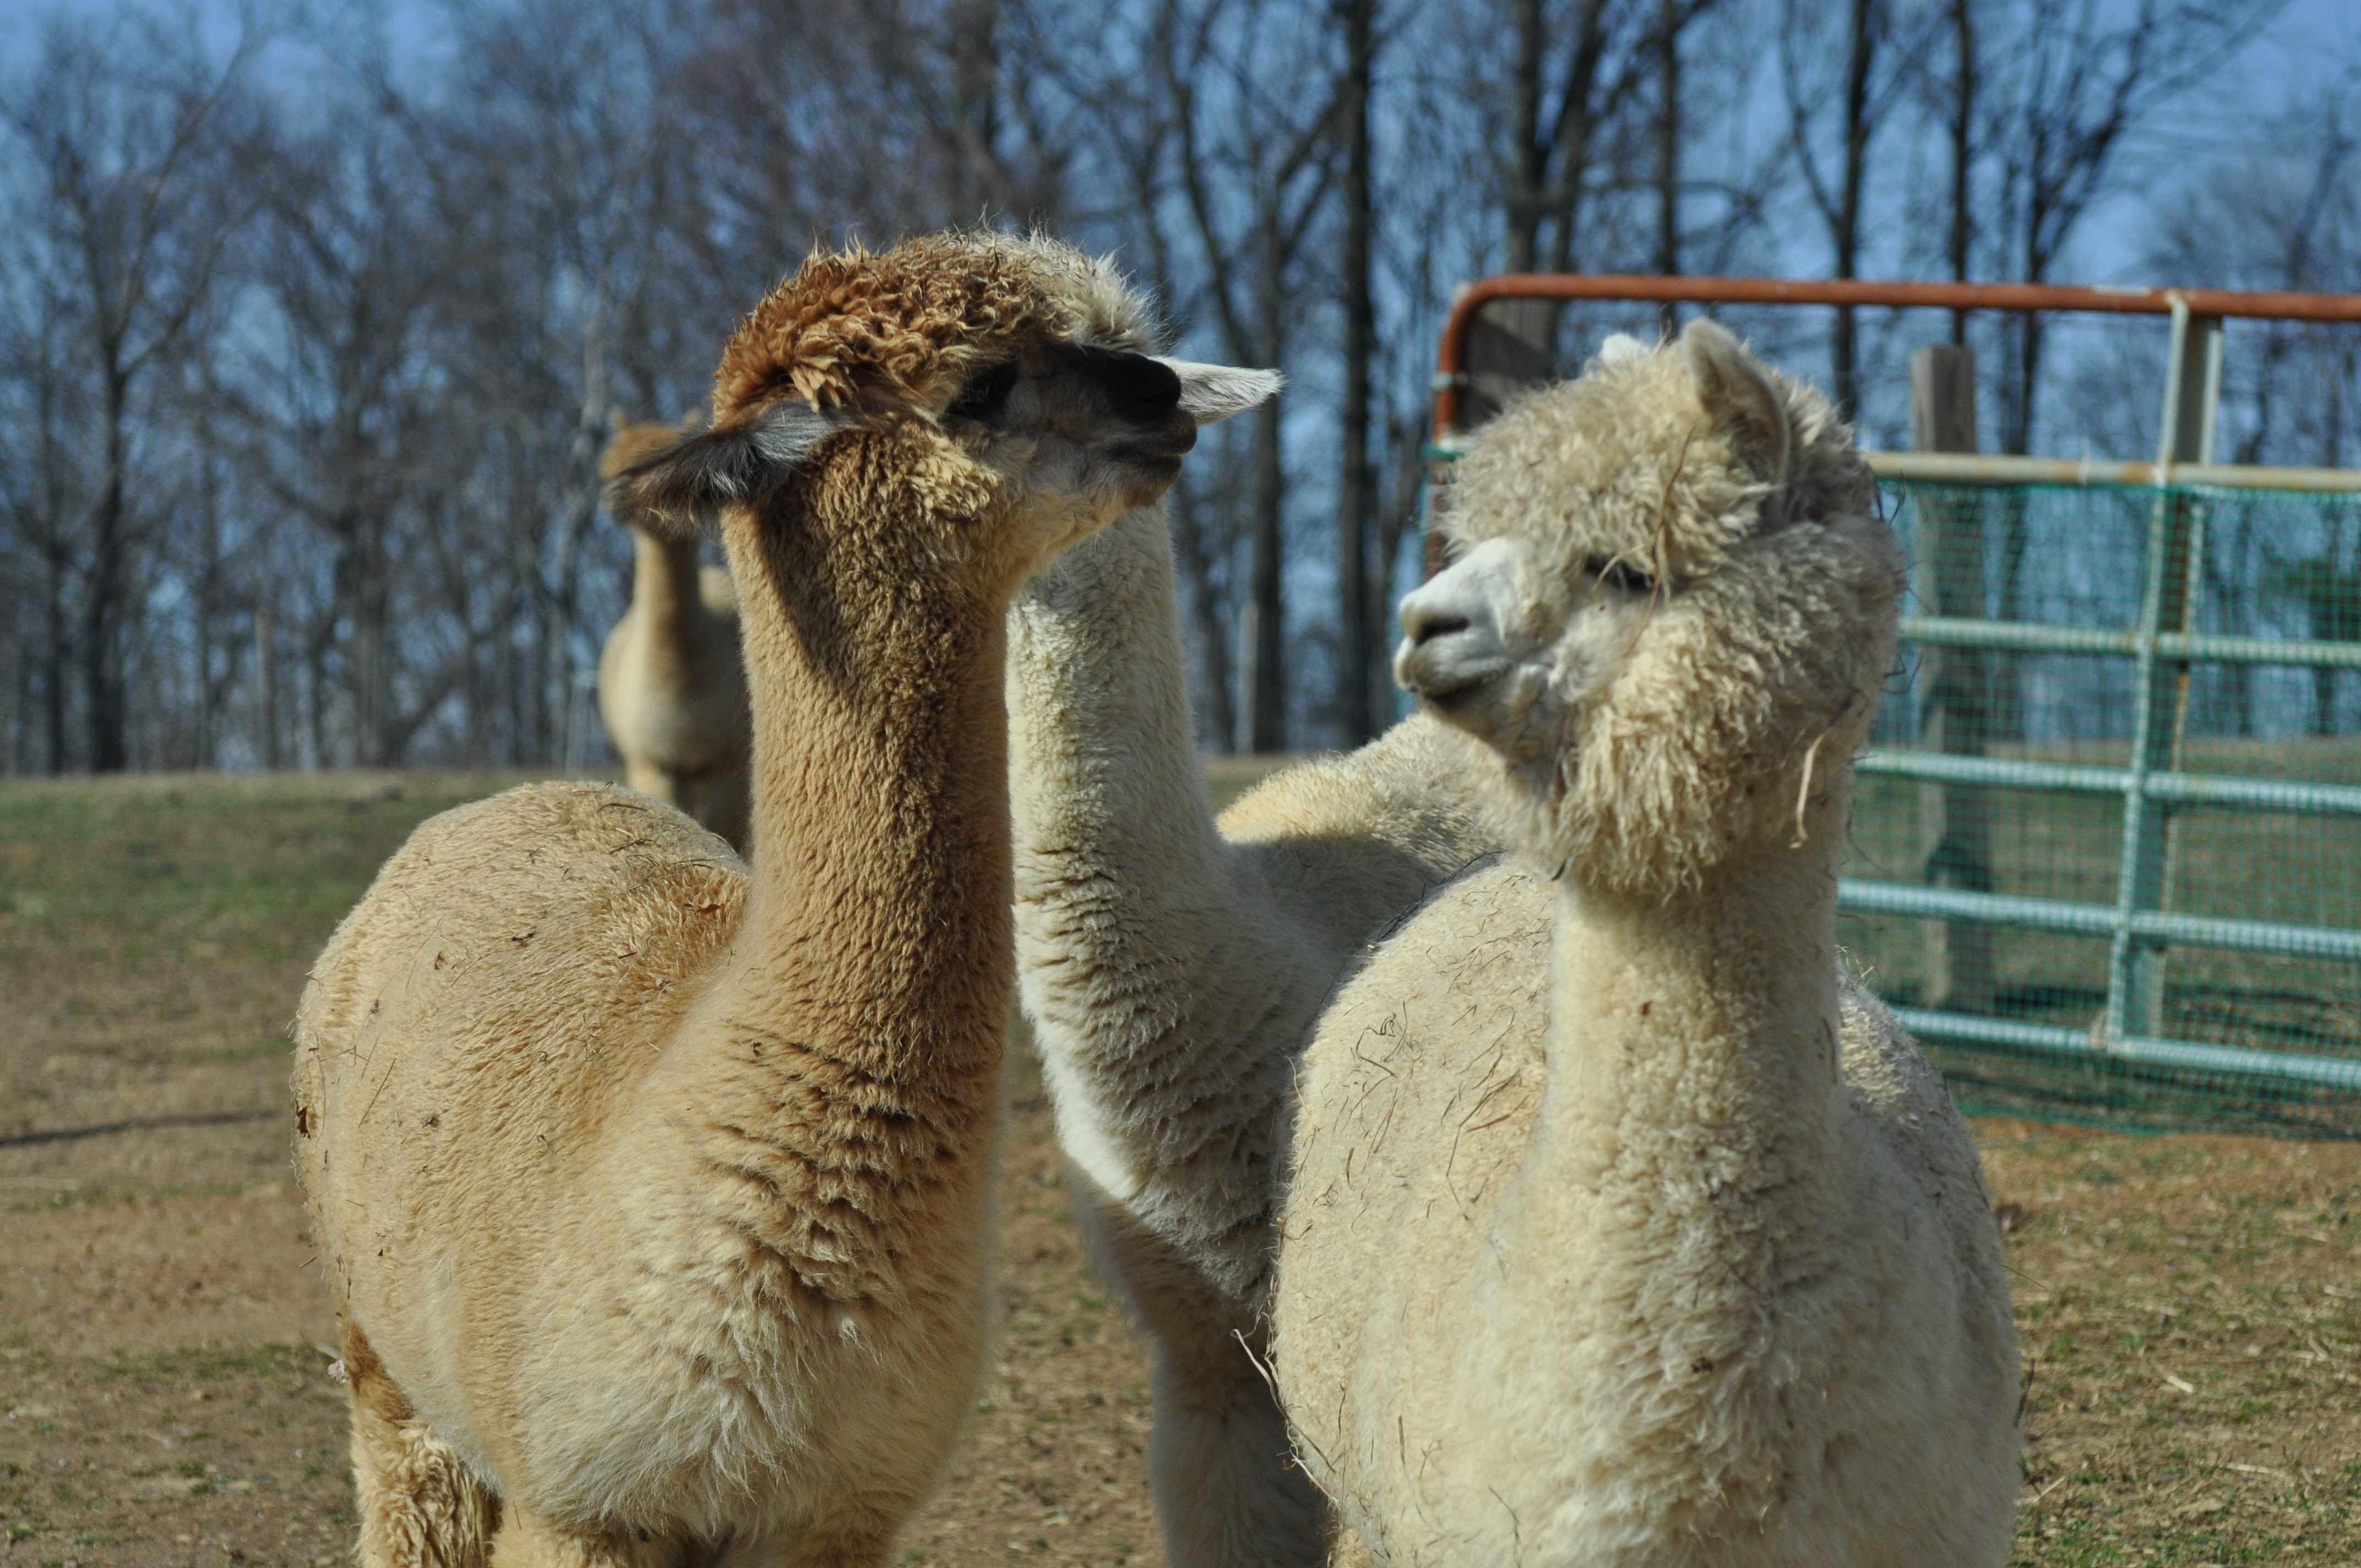 Breezy Hill Alpacas - Knitting & Crochet Club